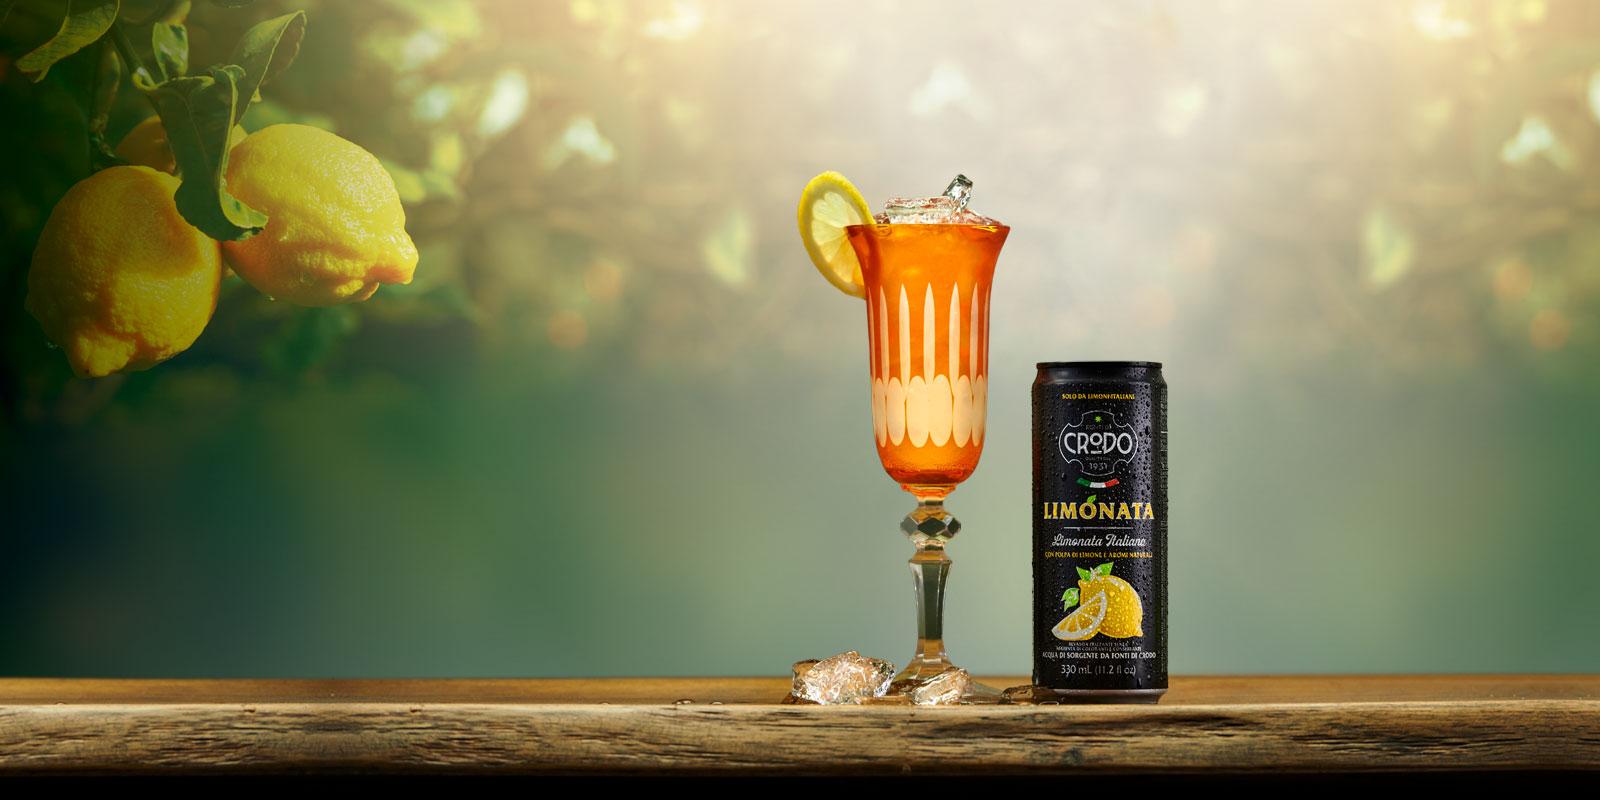 01-02_giin_lemon